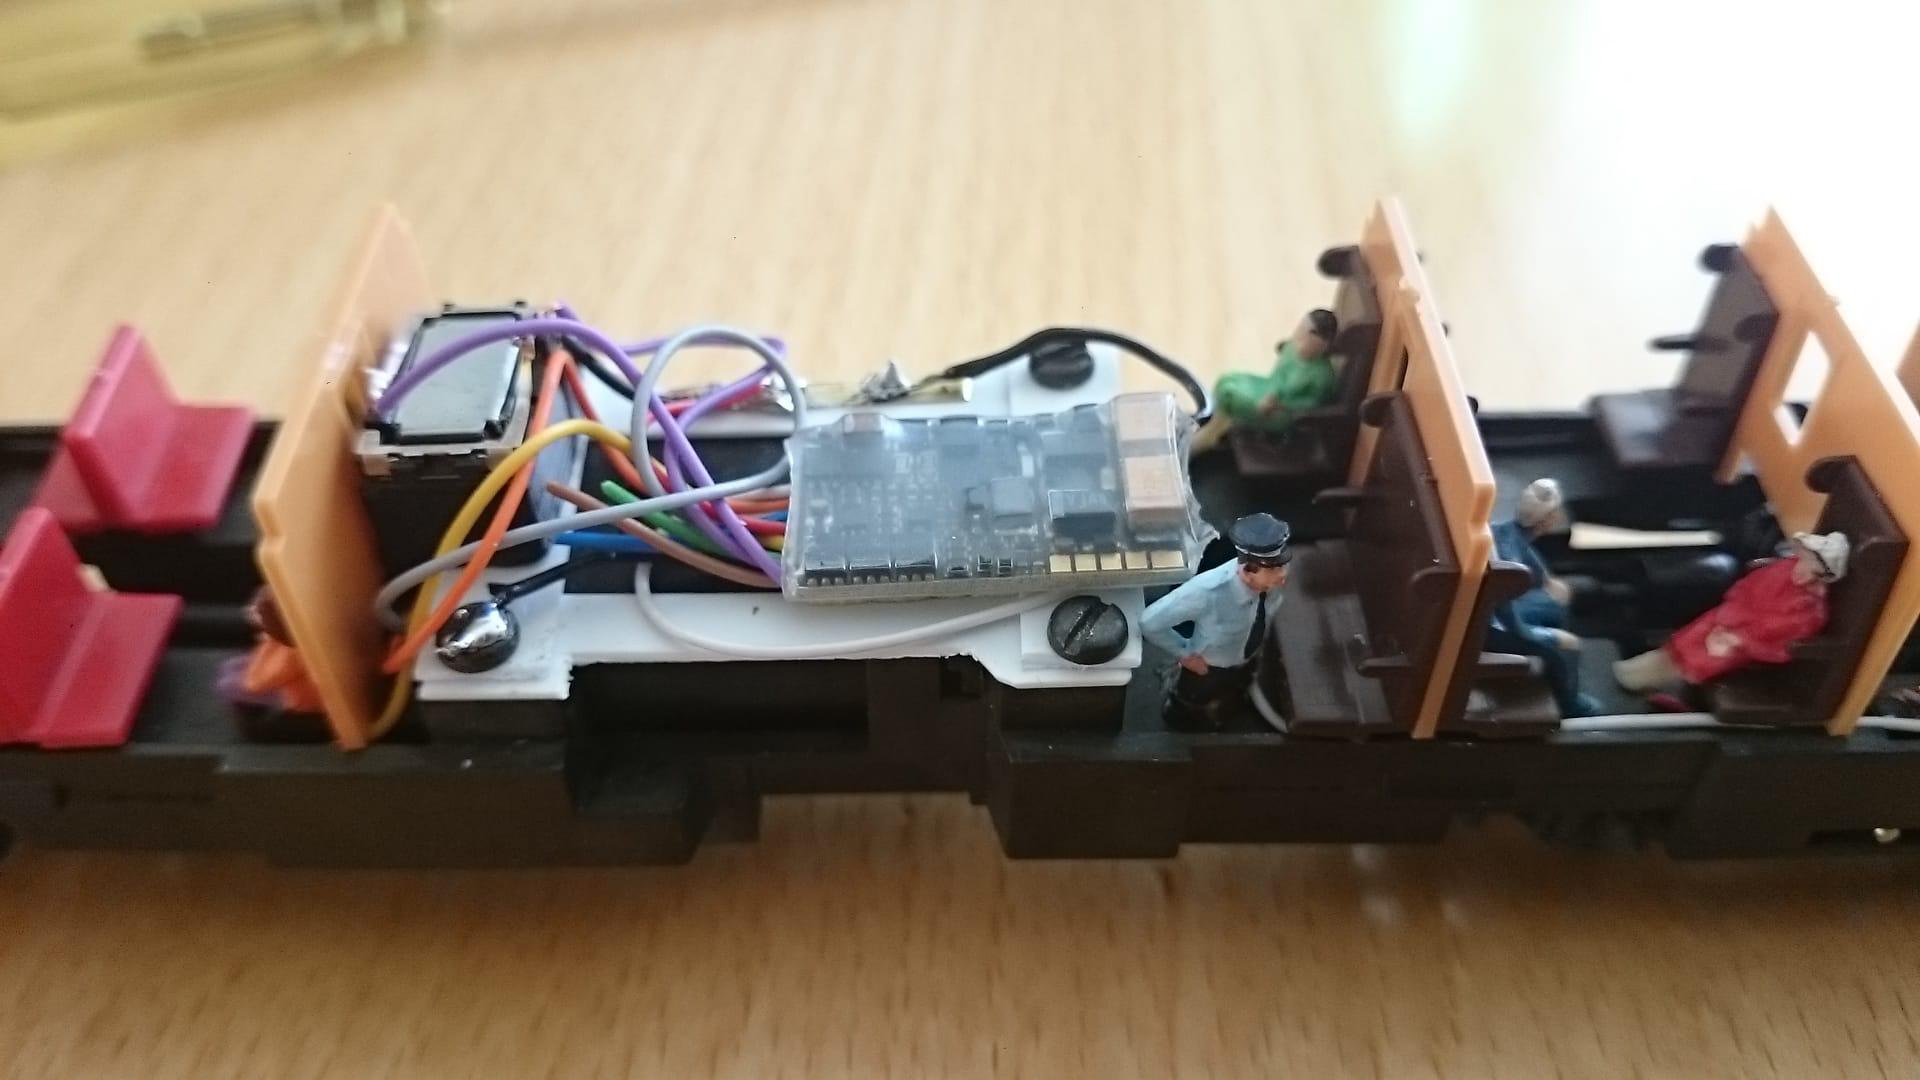 Tw49-Sounddecoder.jpg